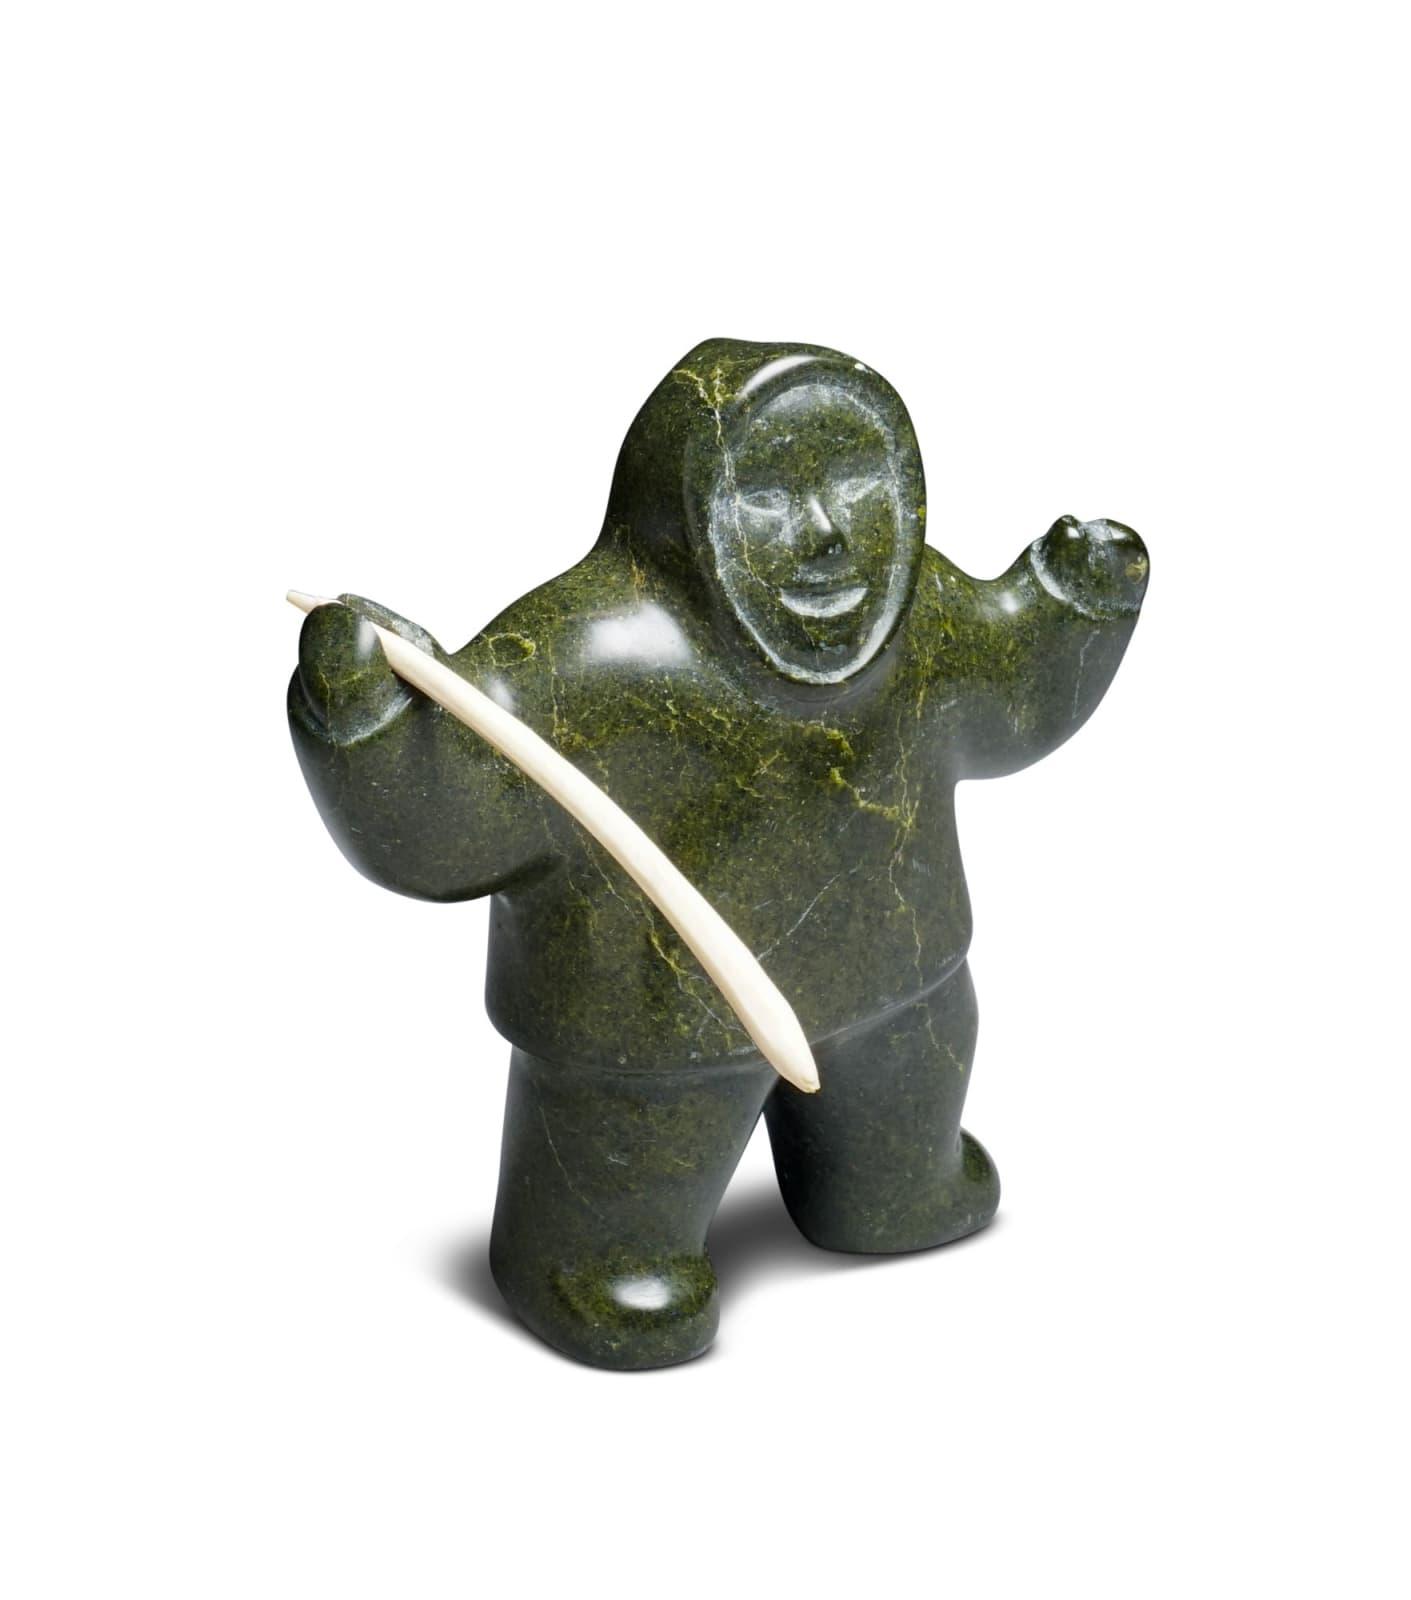 LOT 50 TAQIALUK QAYAQ (1923-D) KANGIQTUGAAPIK (CLYDE RIVER) Happy Hunter, late 1960s stone and antler, 4 3/4 x 4 x 2 in (12.1 x 10.2 x 5.1 cm) ESTIMATE: $300 — $400